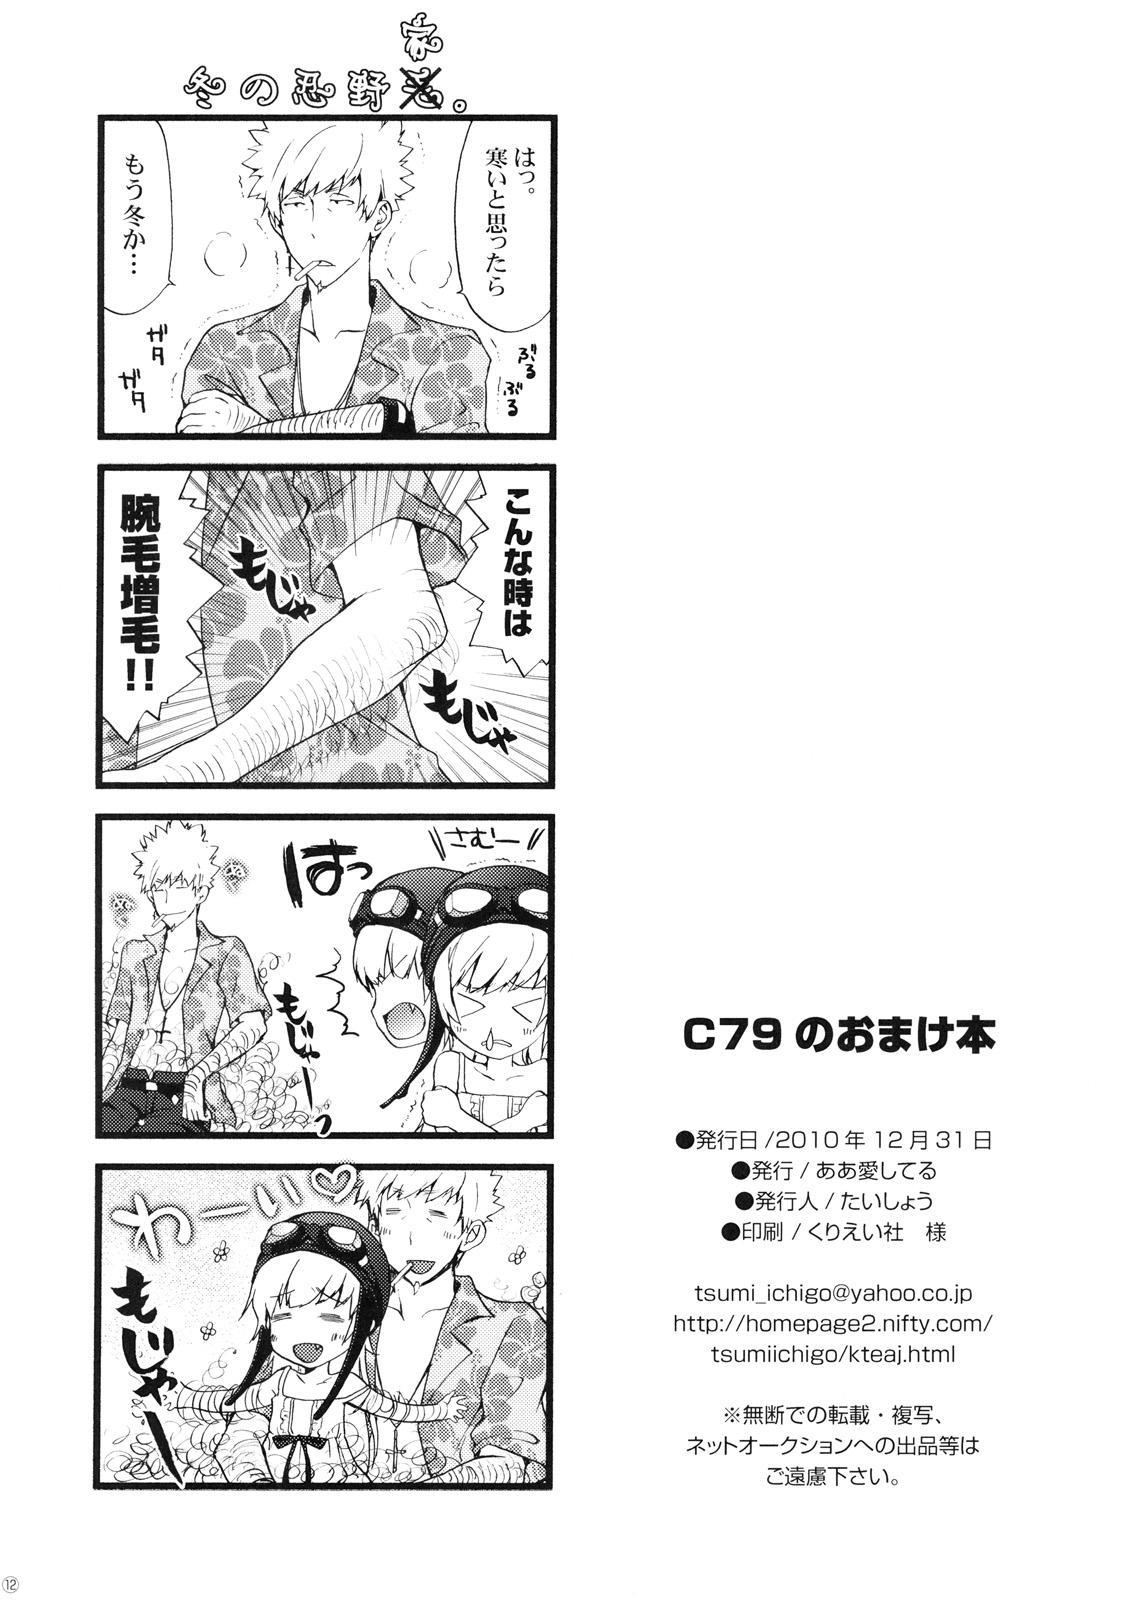 C79 no Omake-bon 11